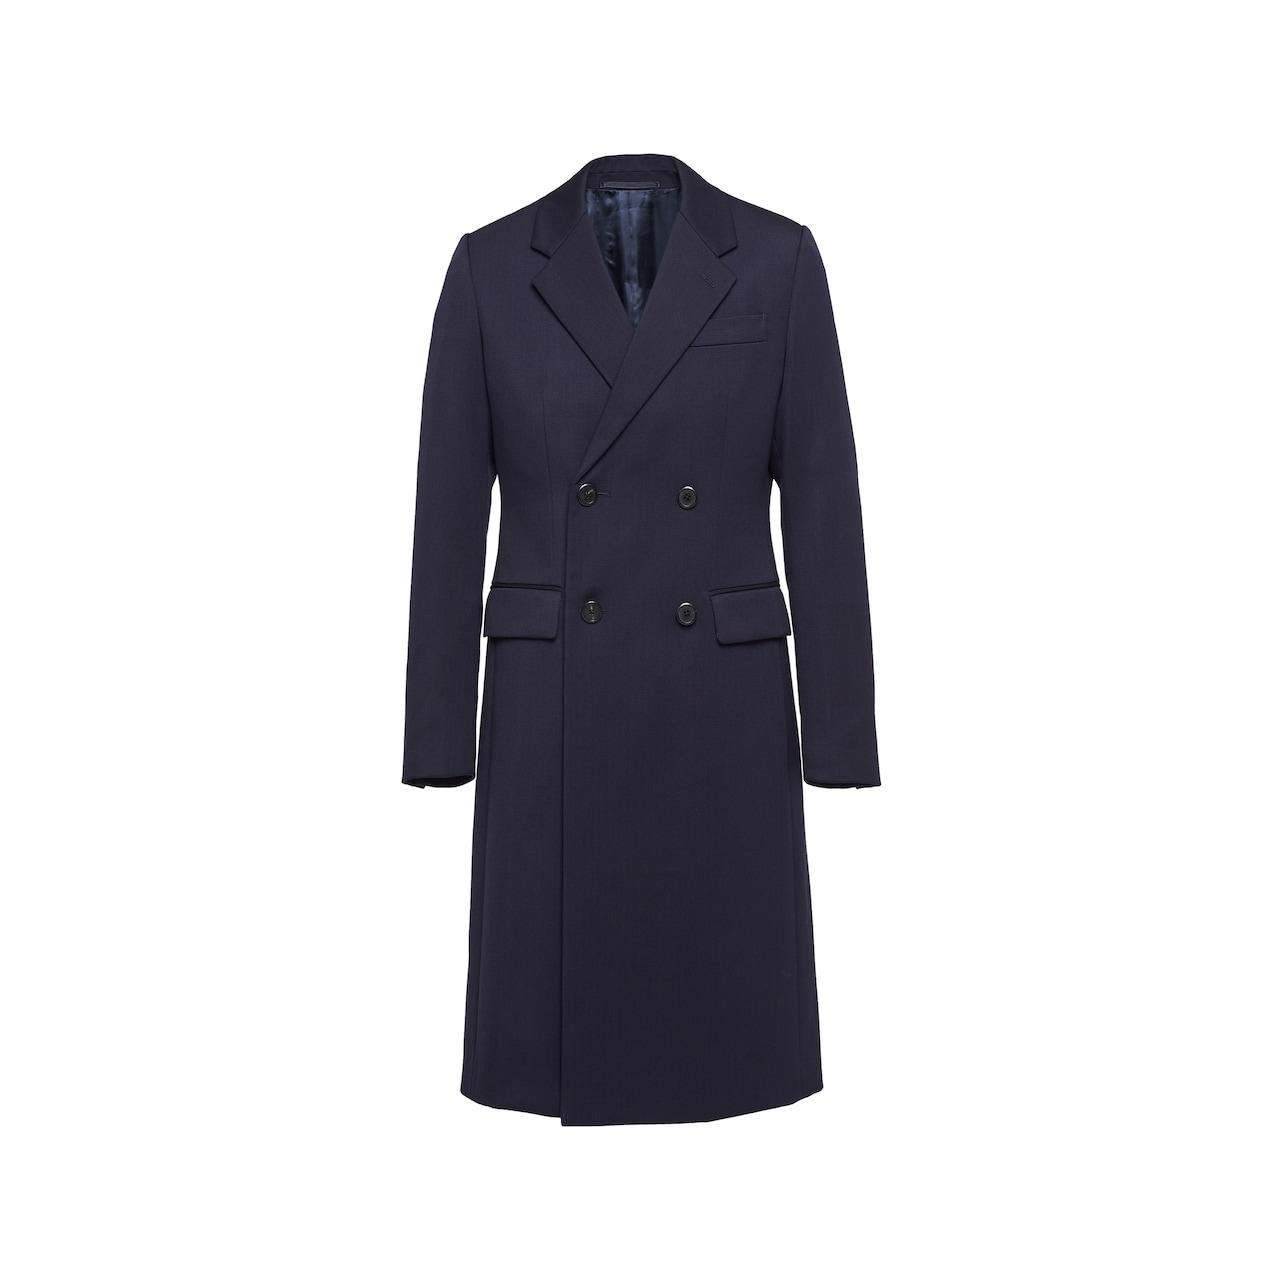 Prada Double-breasted wool coat 1